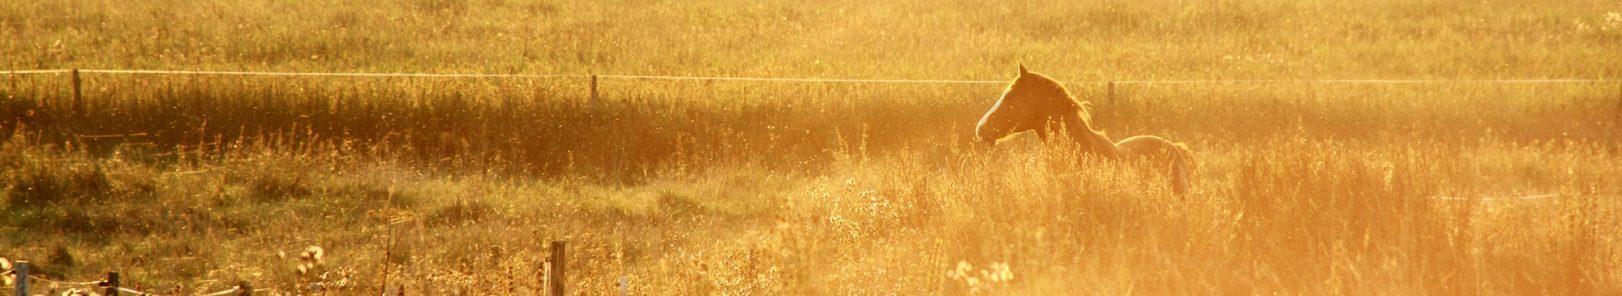 Horse in golden field